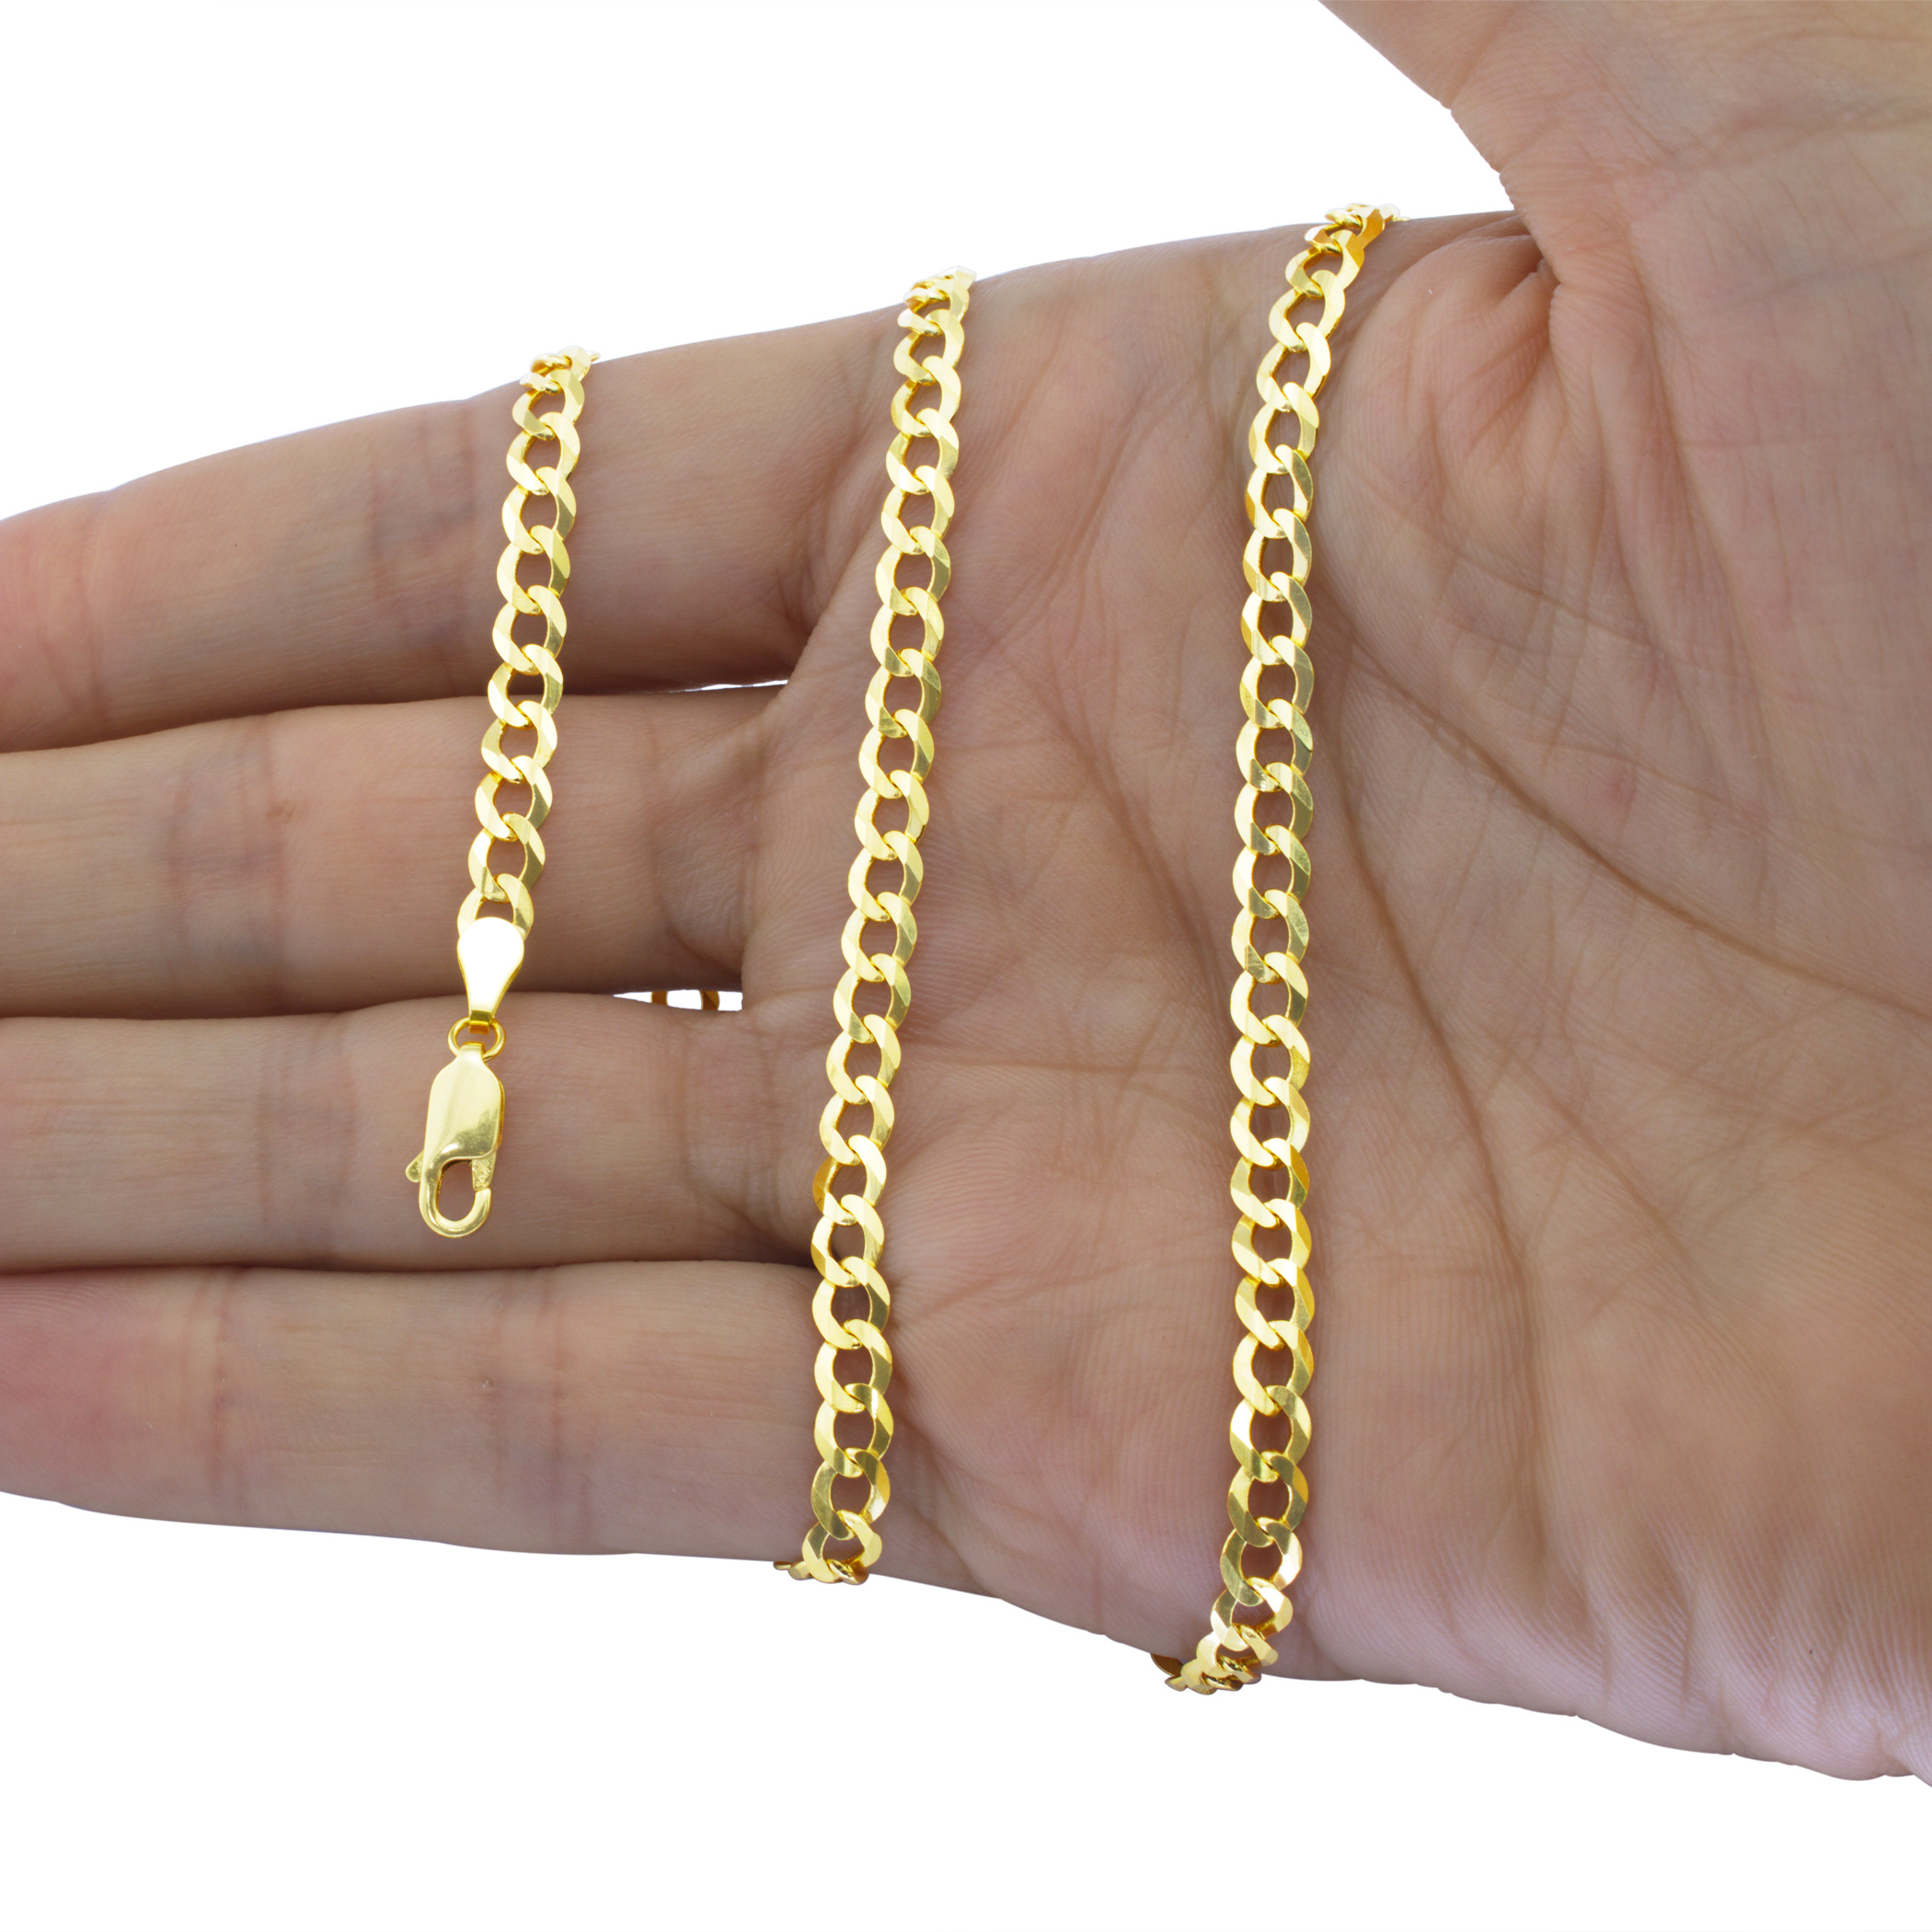 Solid-14K-Yellow-Gold-2-5mm-12mm-Cuban-Curb-Chain-Link-Bracelet-Men-Women-7-034-9-034 thumbnail 19